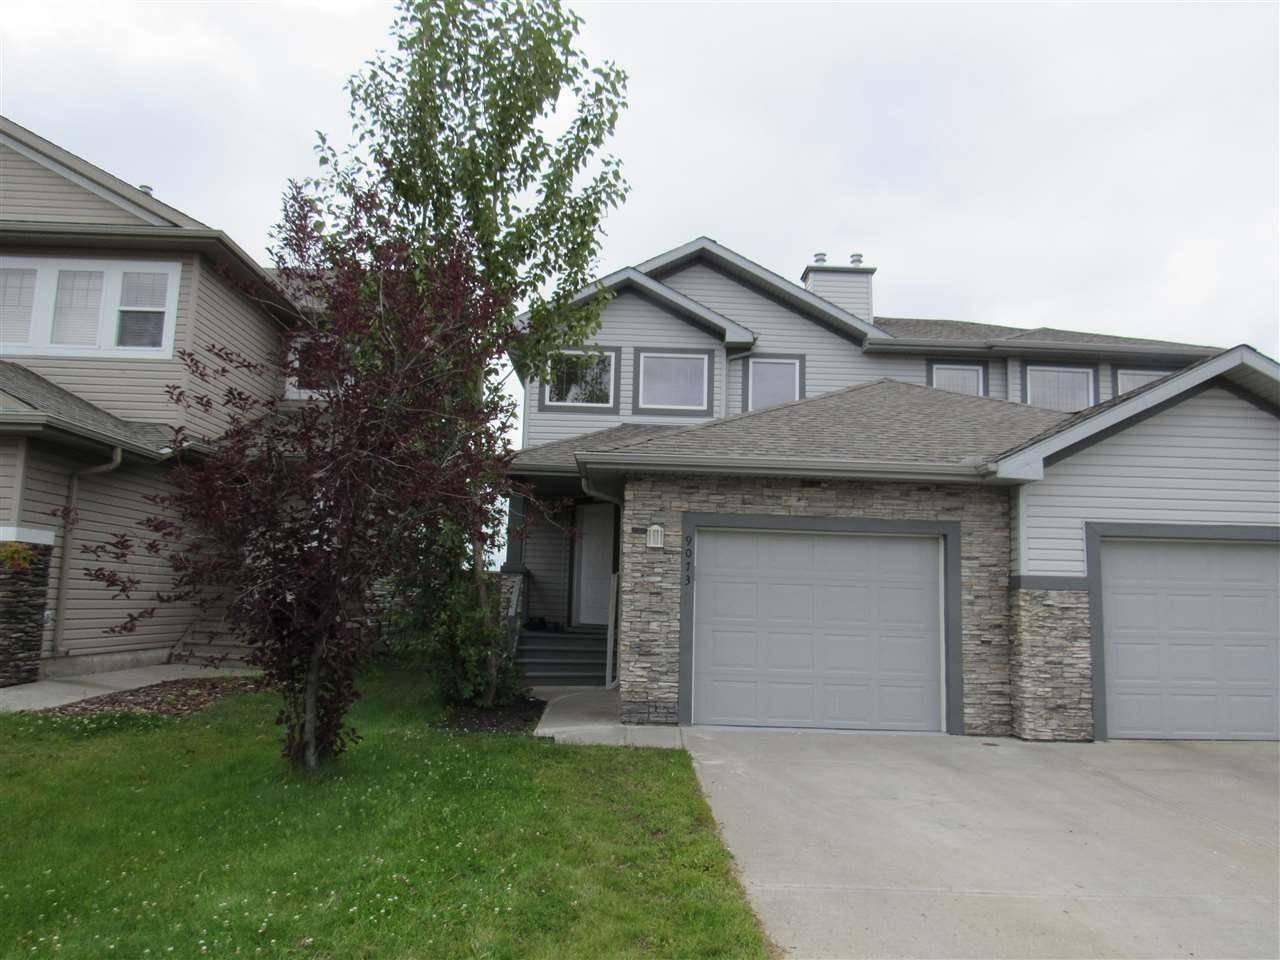 Townhouse for sale at 9073 Scott Cres Nw Edmonton Alberta - MLS: E4170632